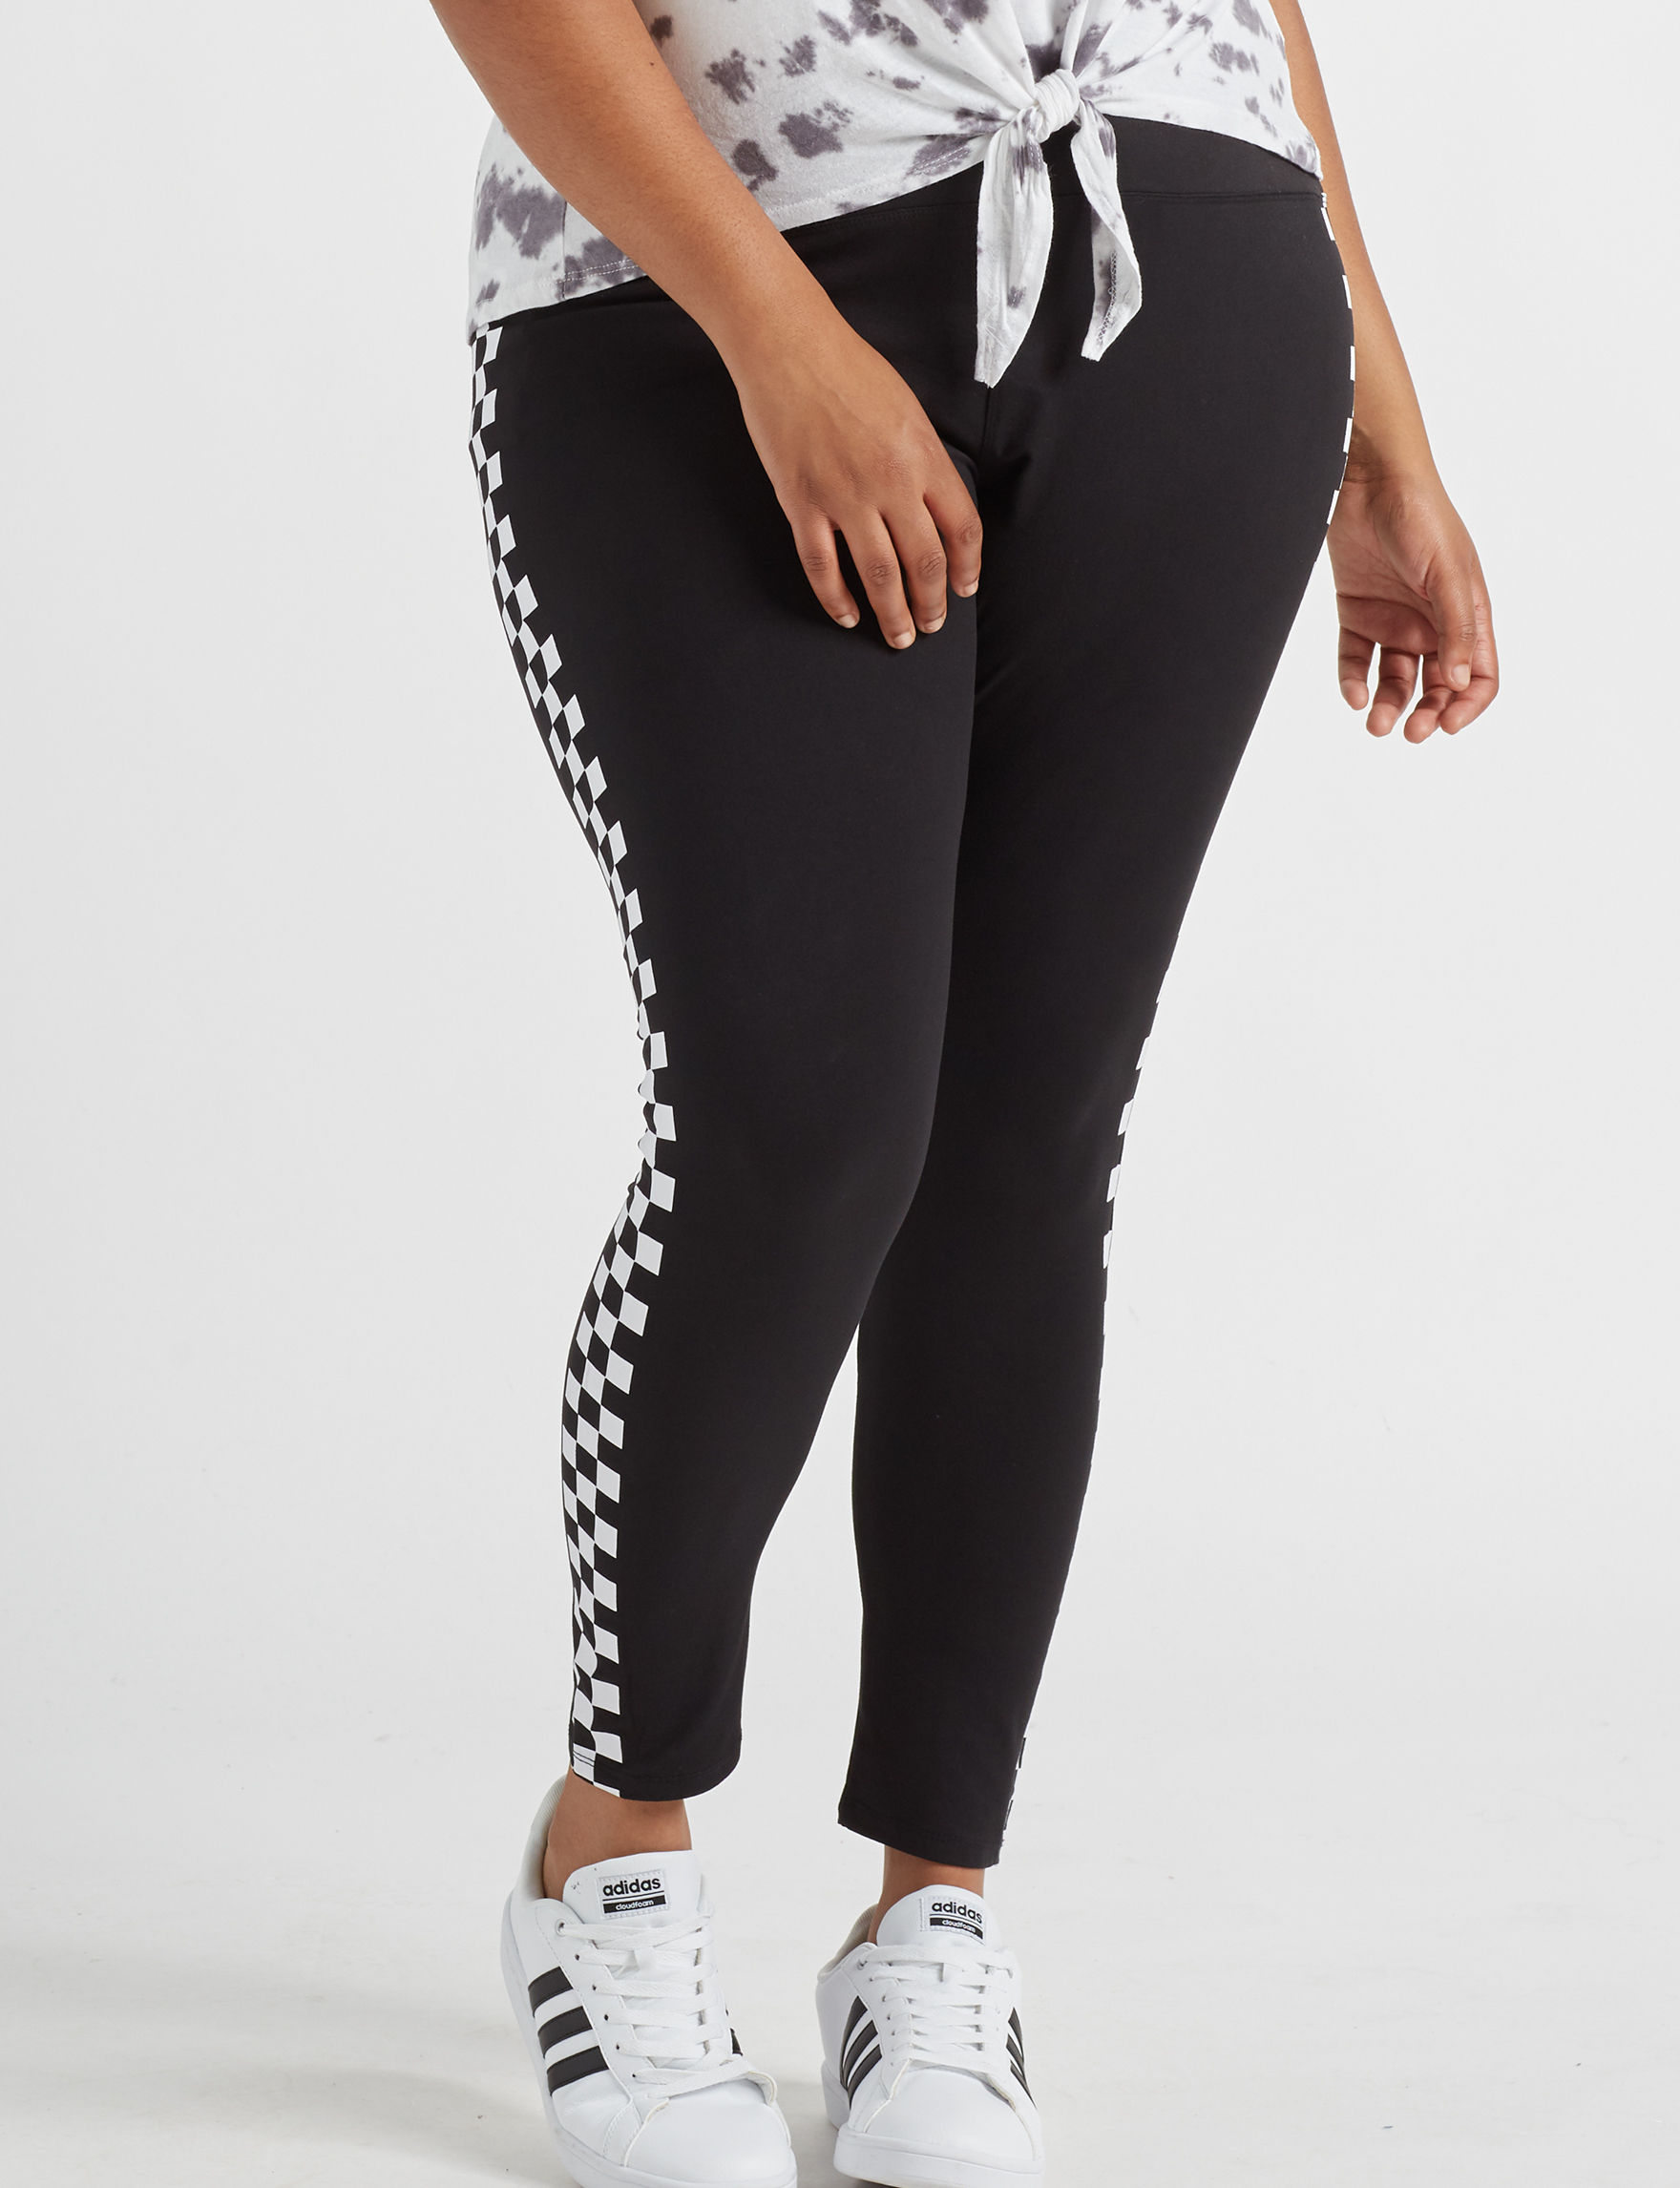 Justify Black Soft Pants